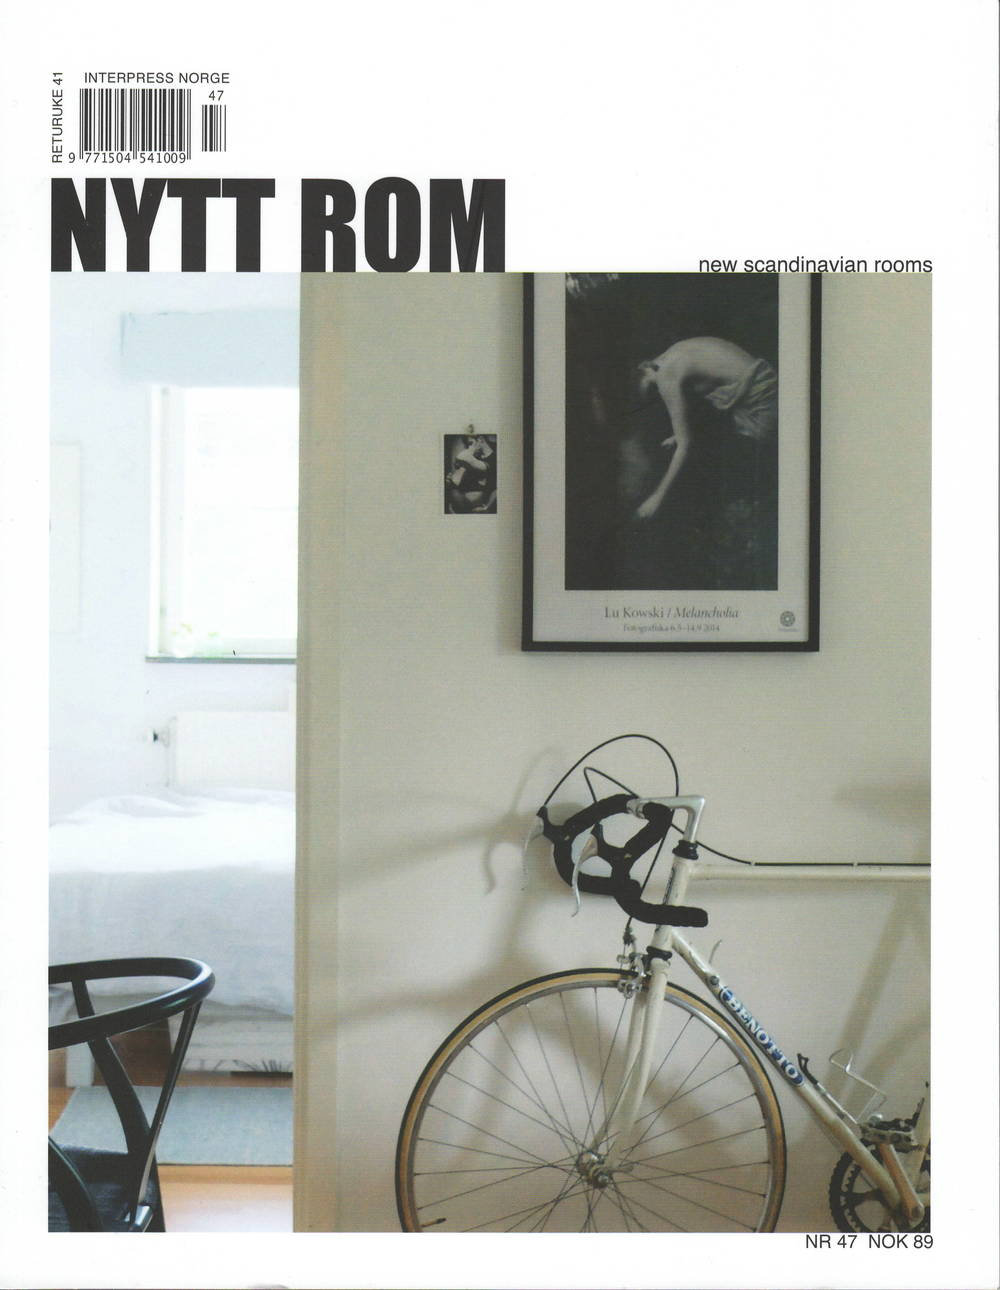 Nyttrom-08-15_cover 1.jpeg